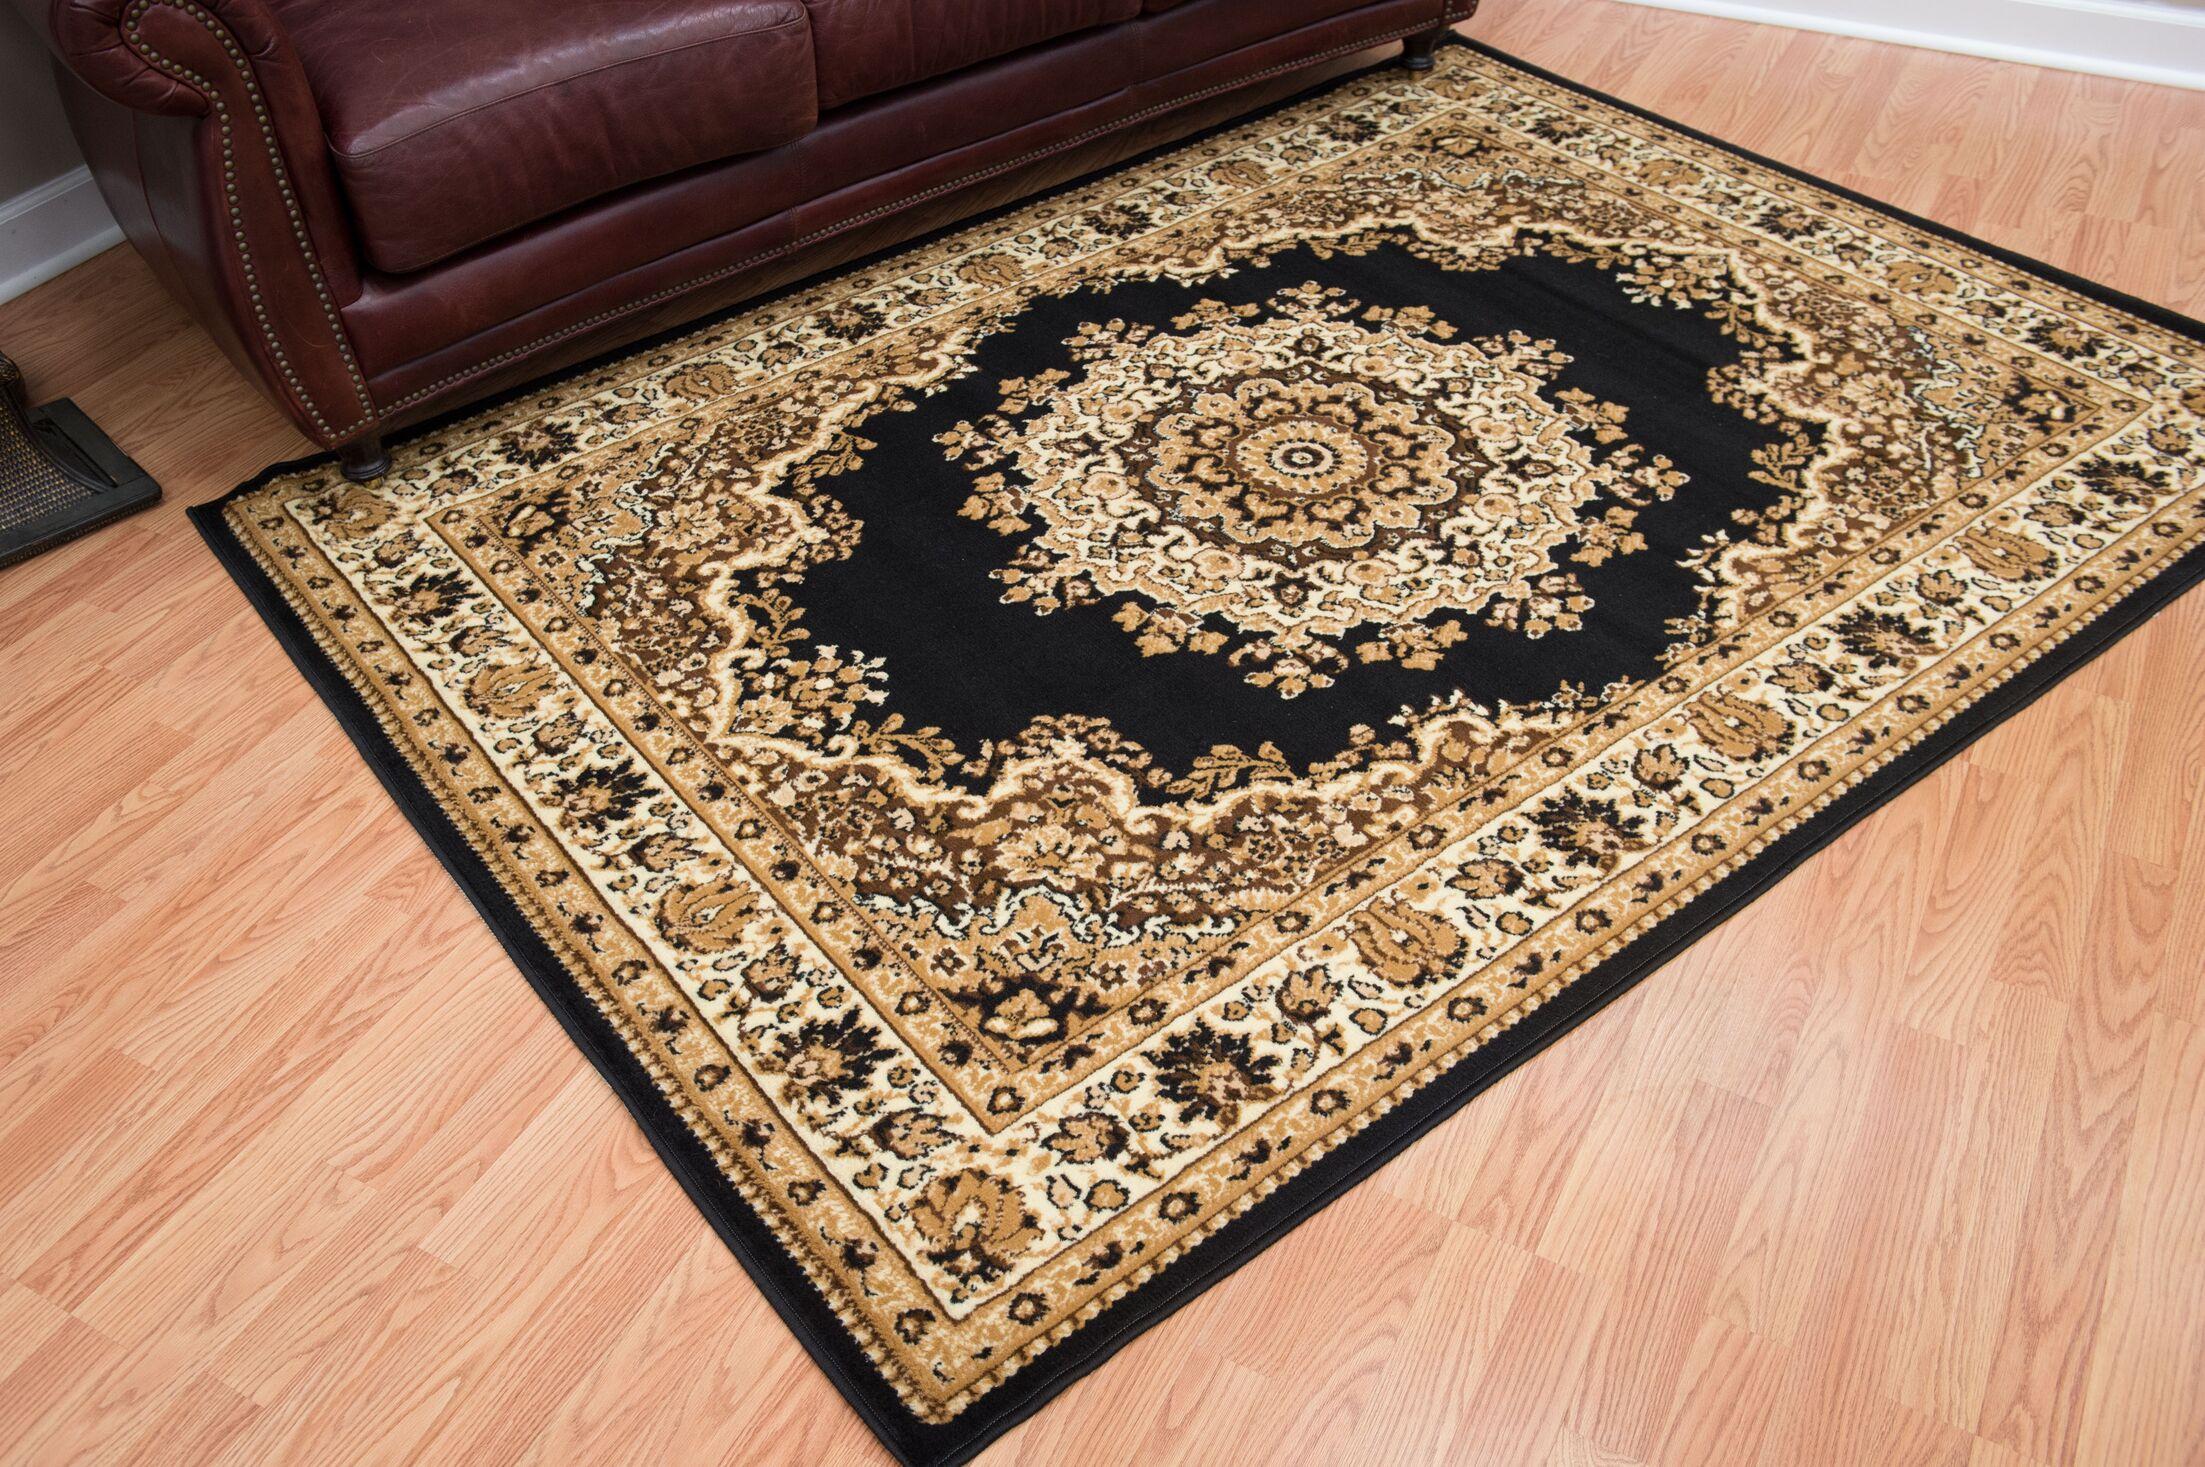 Dallas Floral Kirman Black Area Rug Rug Size: 5'3